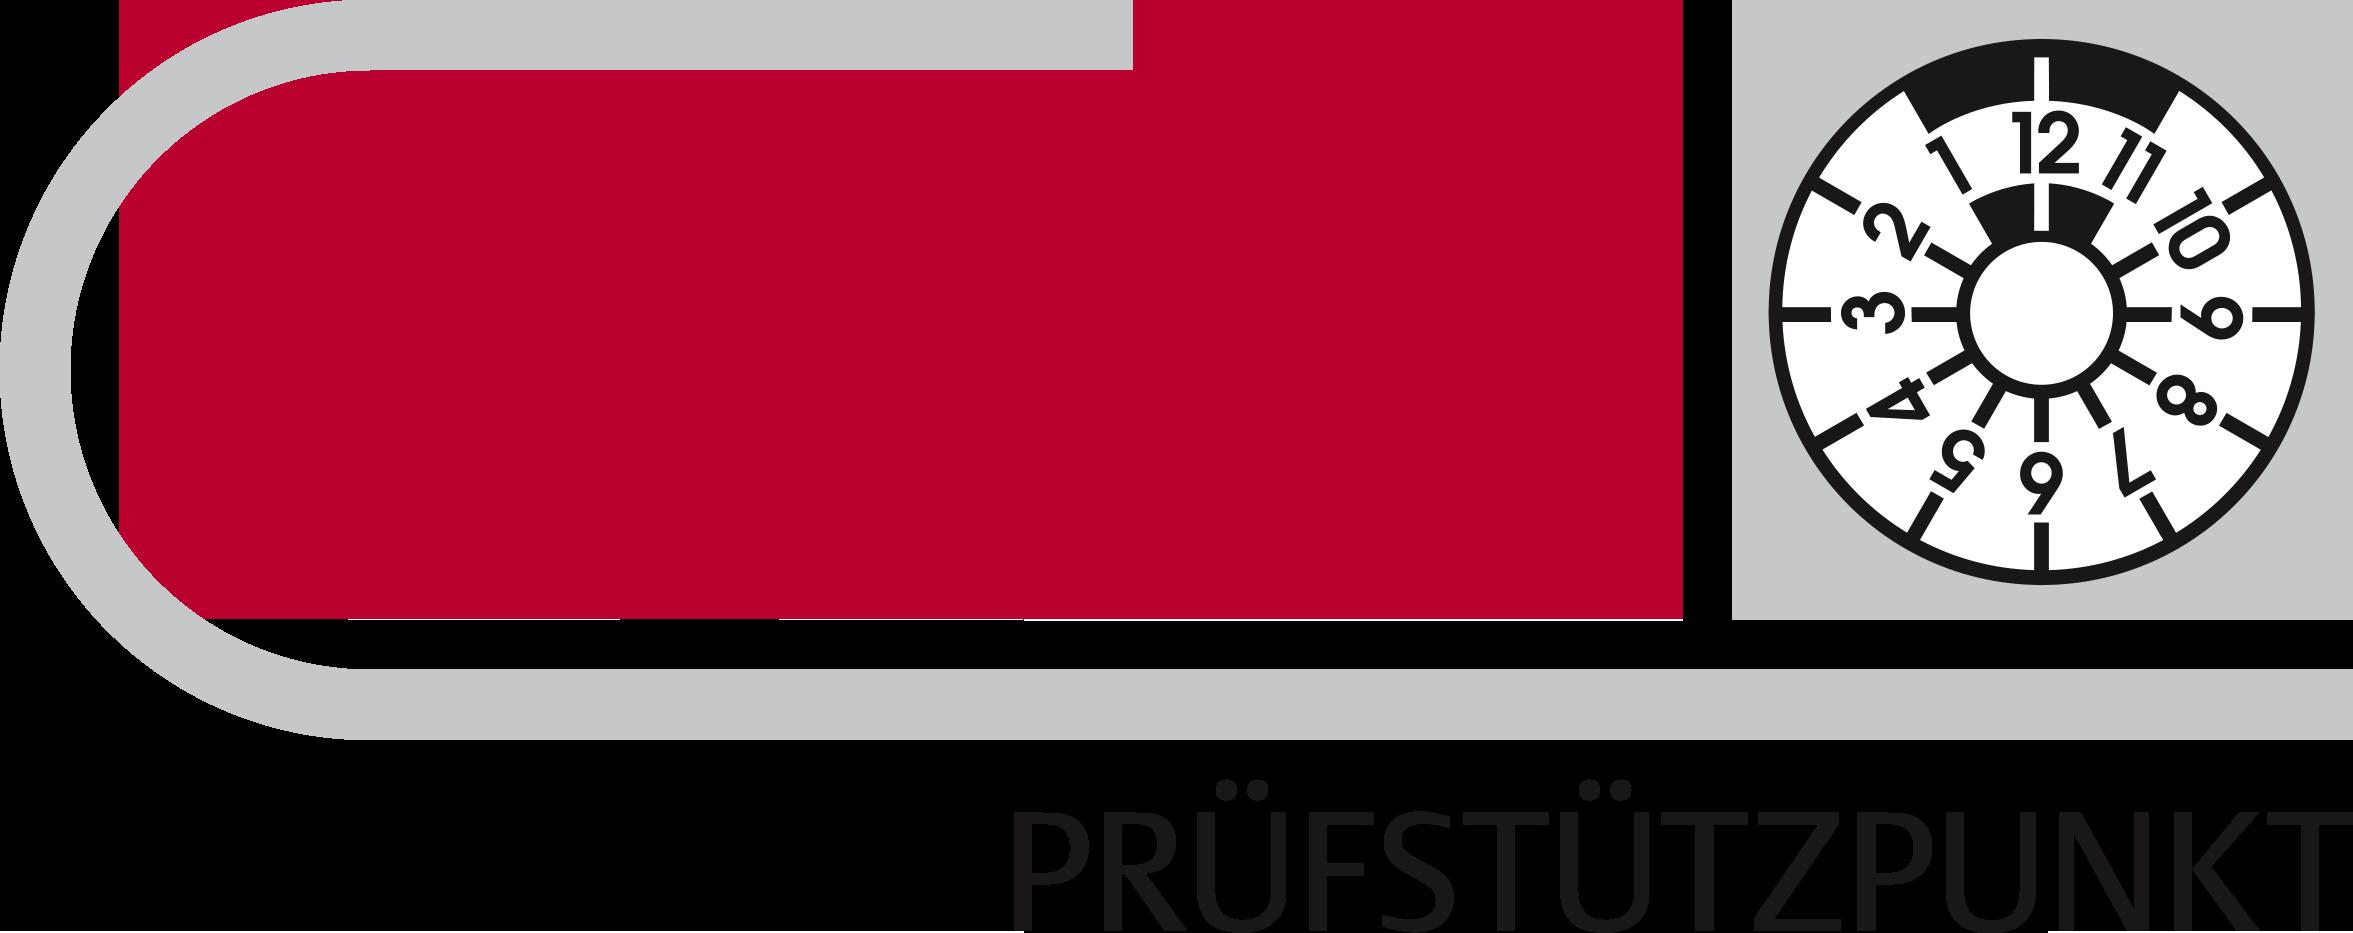 Kurth Autokrane GmbH & Co. KG - GTÜ-Prüfstützpunkt